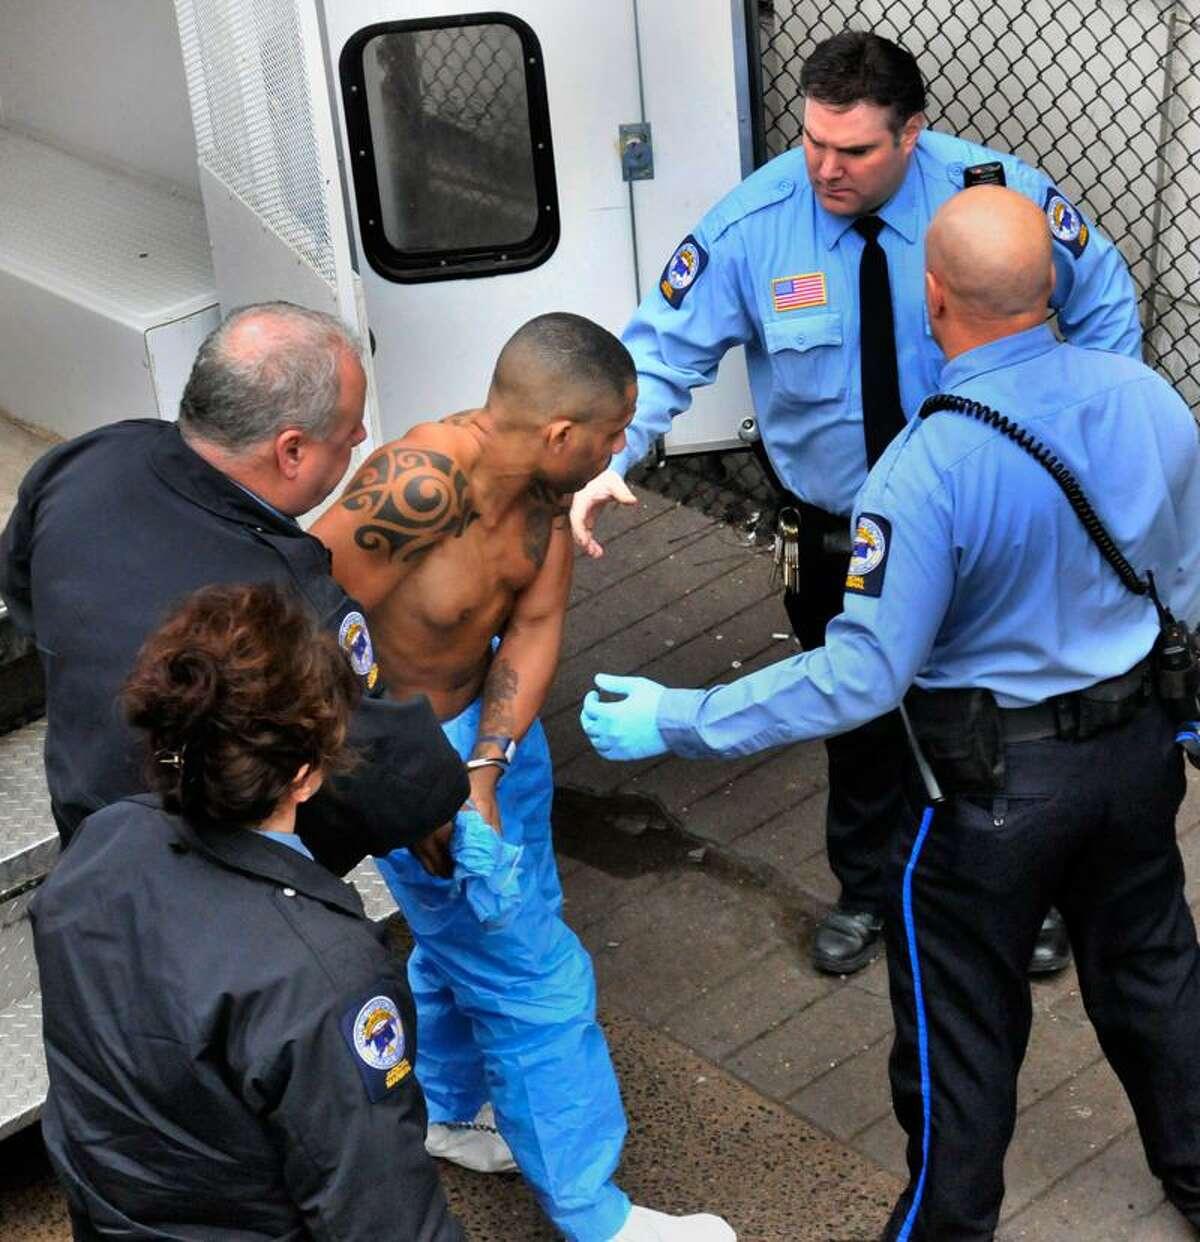 Alleged 'East Coast Rapist' Aaron Thomas of New Haven arrives at Superior Court Monday. Melanie Stengel/Register